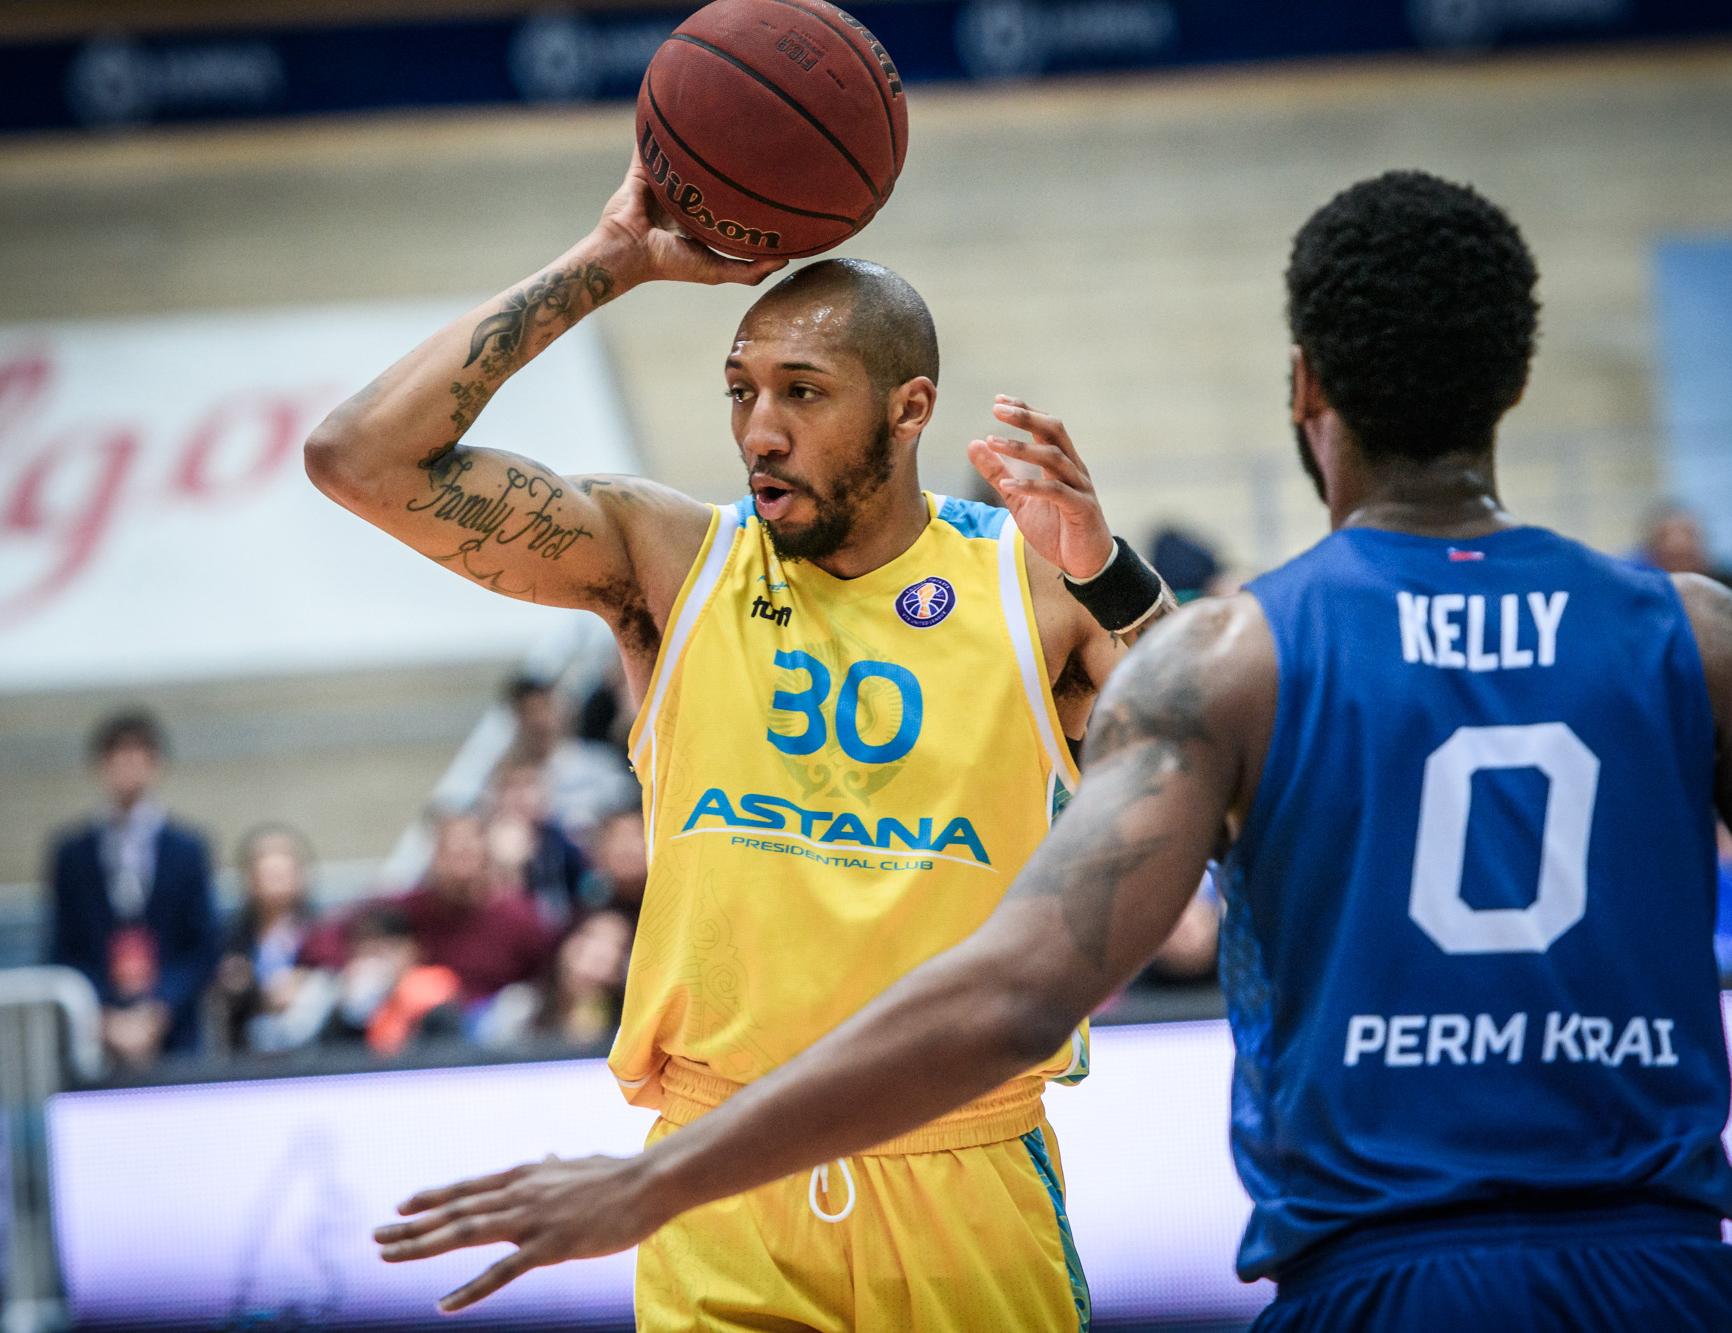 Astana Sets Club Record For Wins